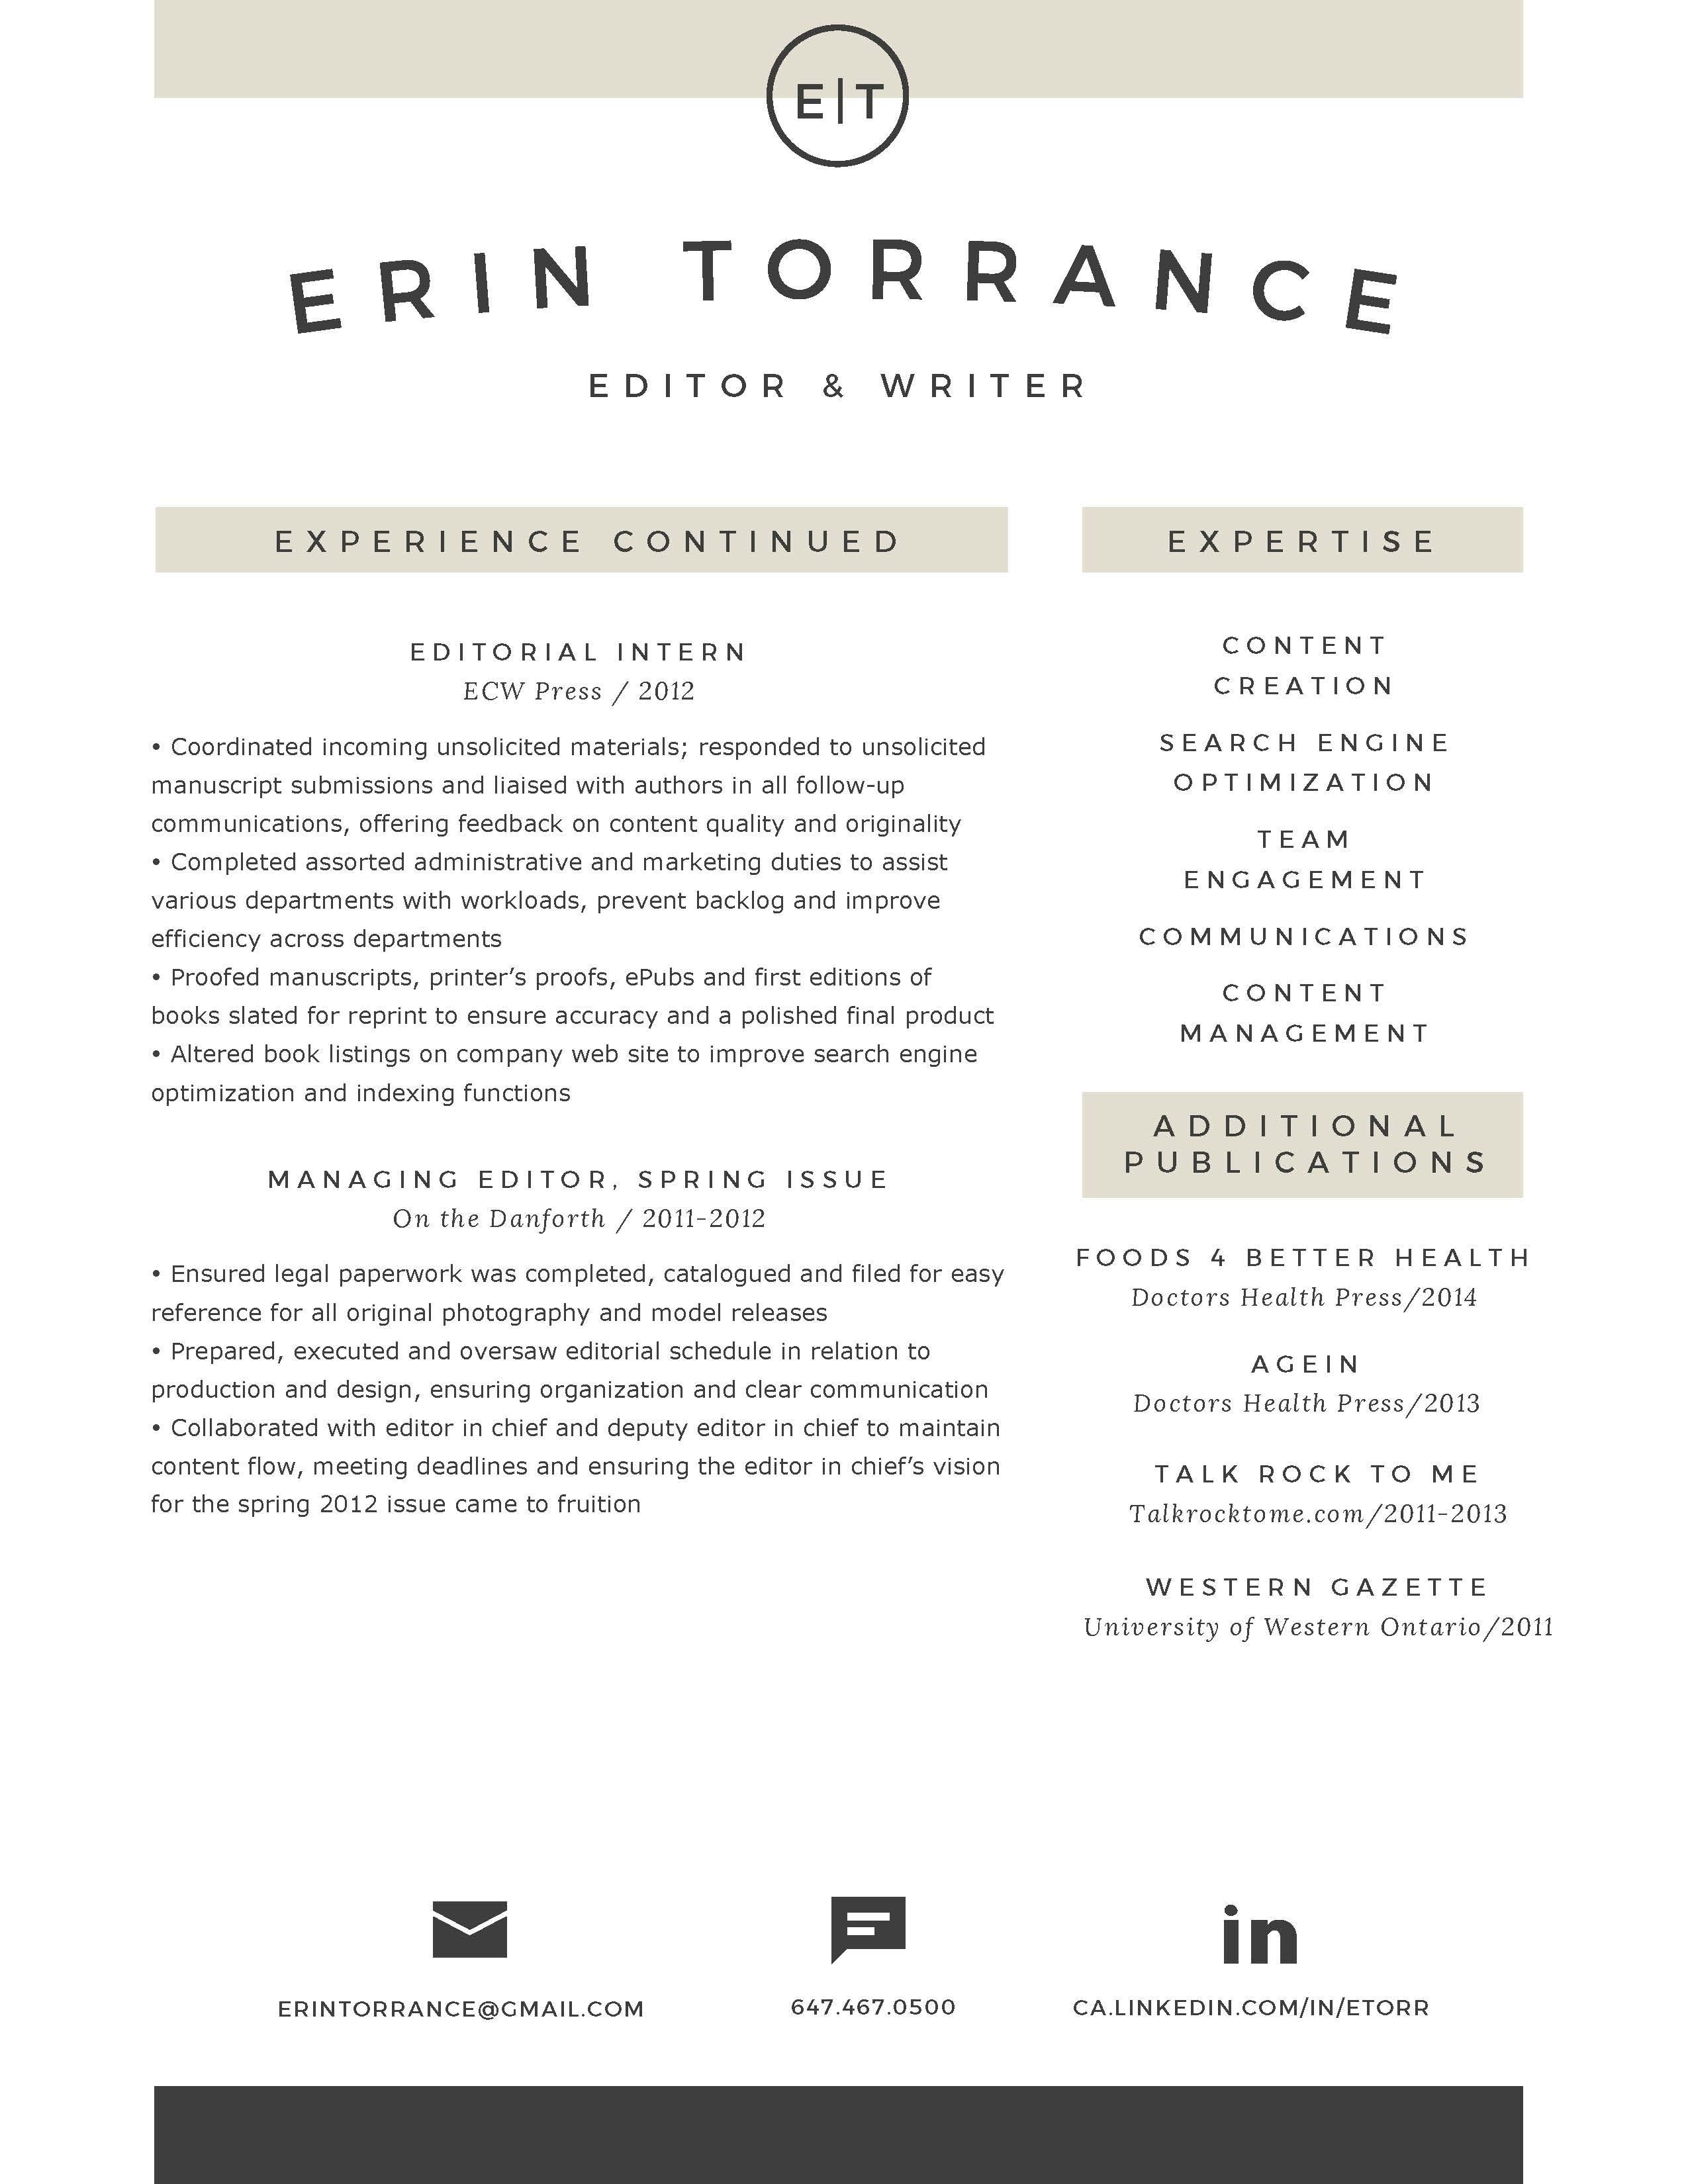 erin torrance resume associate editor  1  page 2